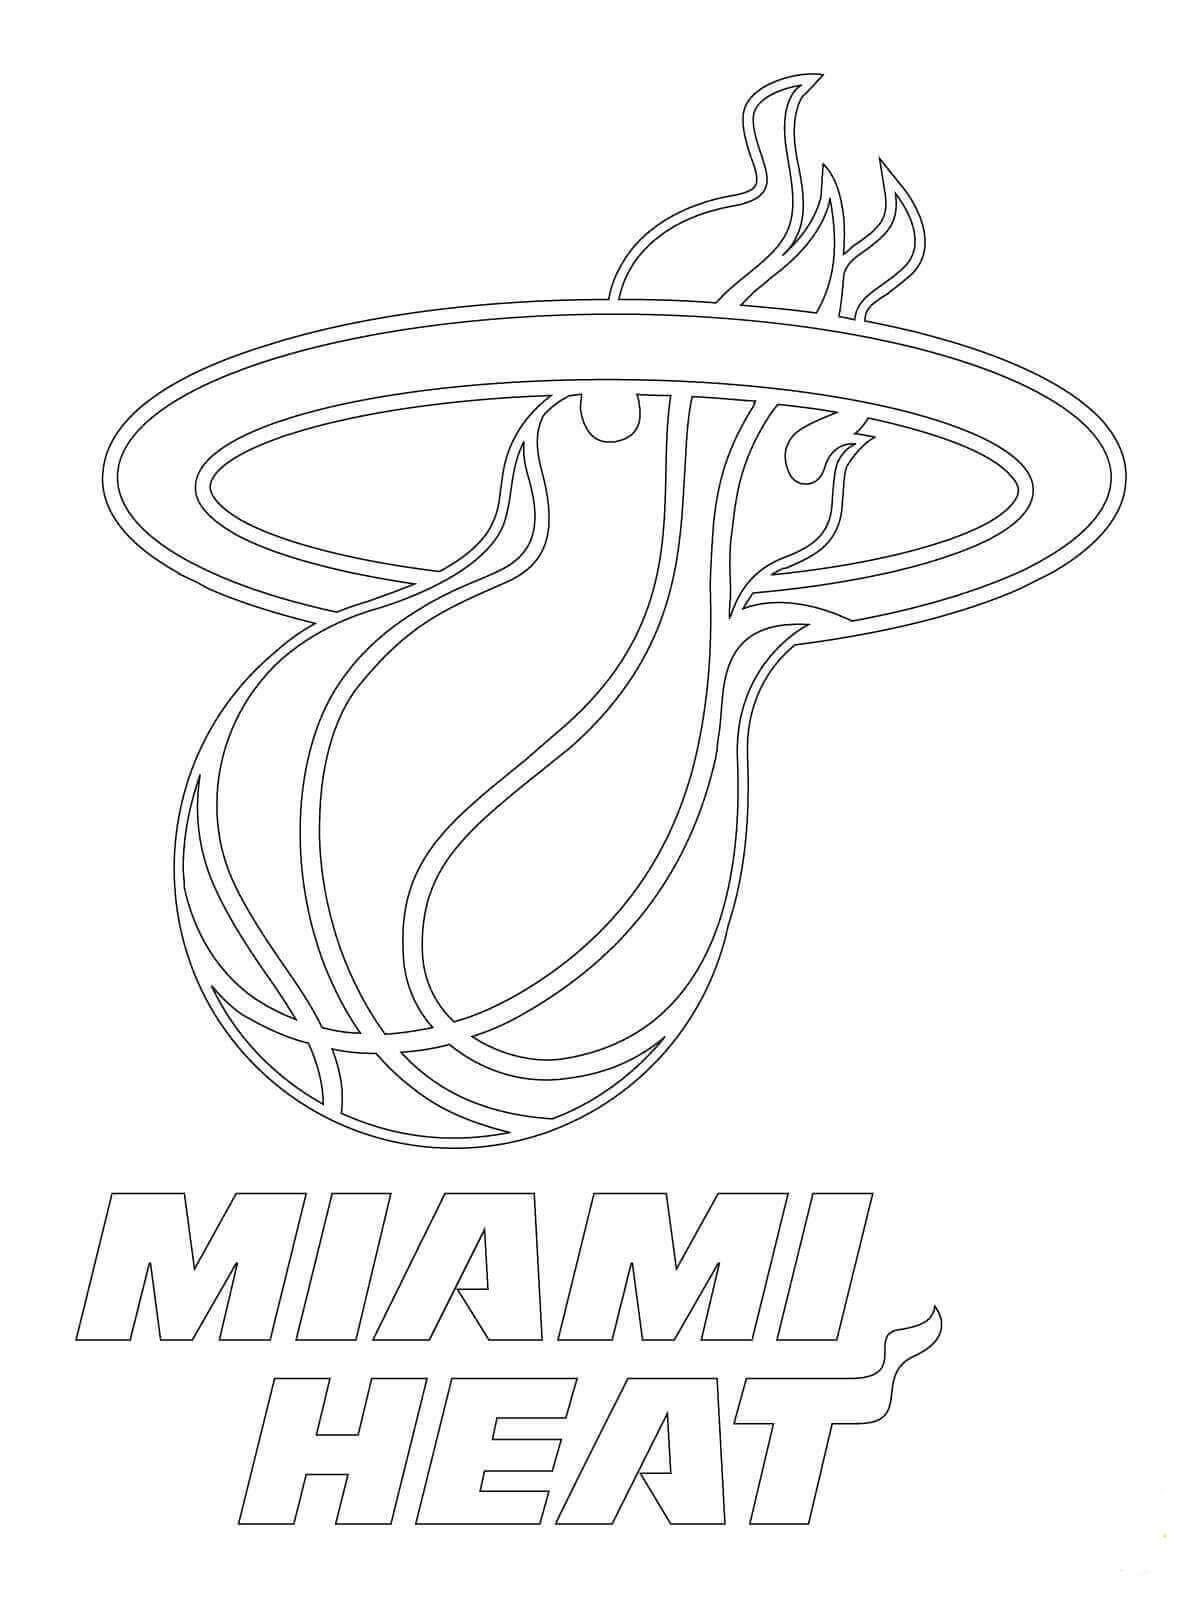 Free Printable Nba National Basketball Association Coloring Pages